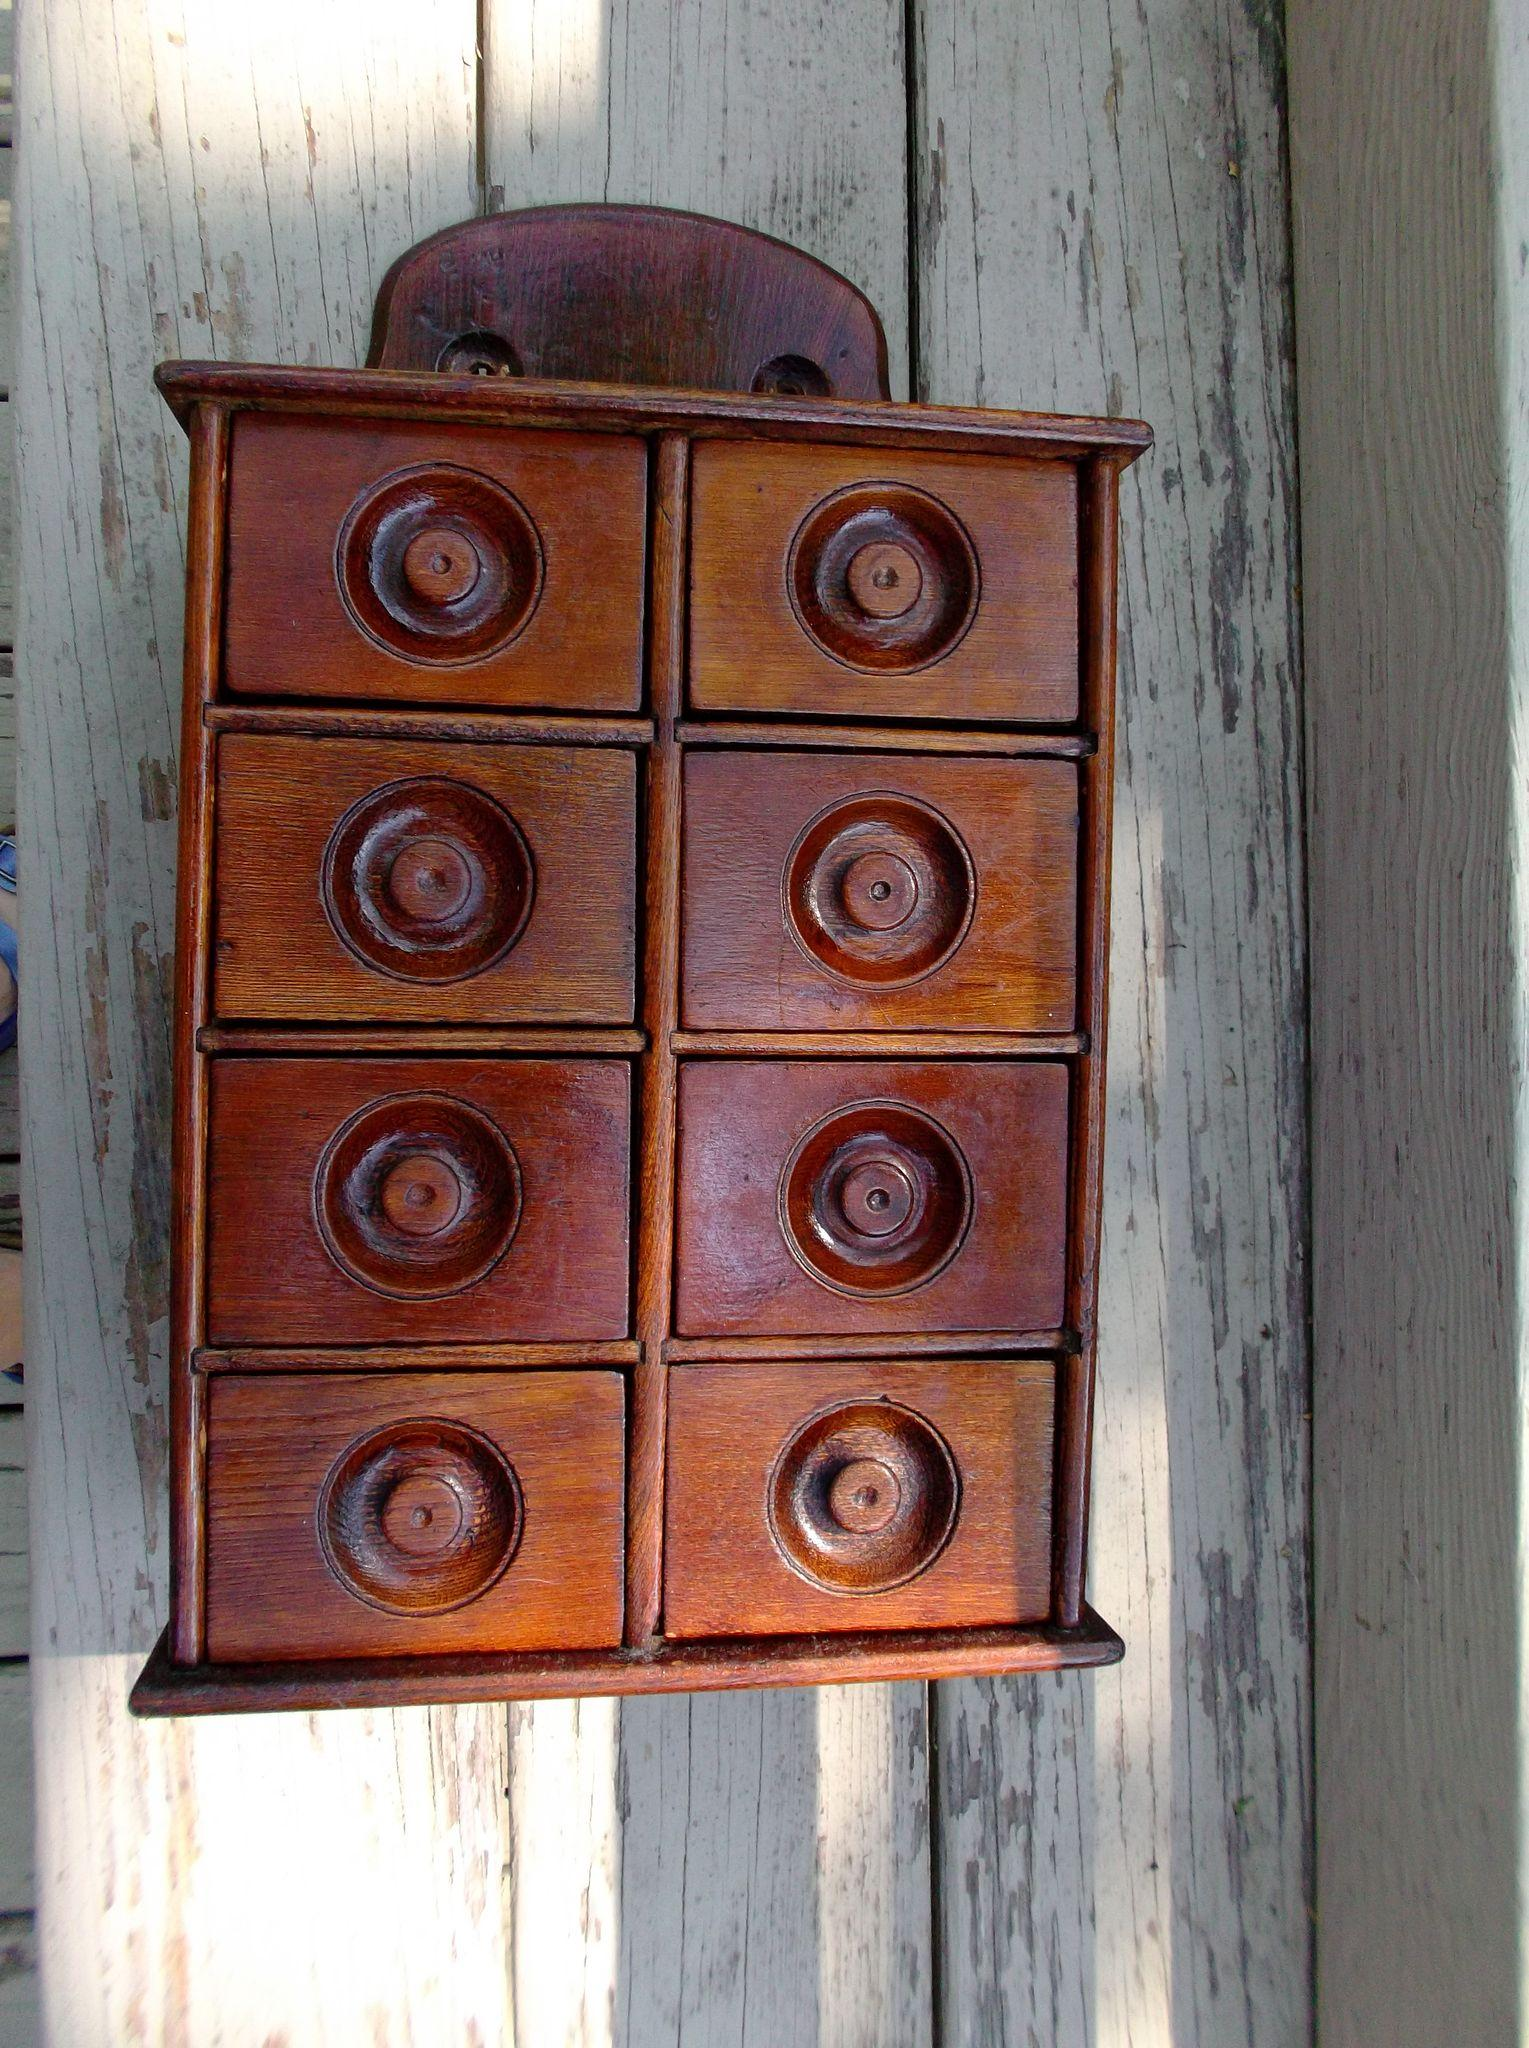 Antique Wooden Kitchen Cabinets ~ Antique spice cabinet furniture